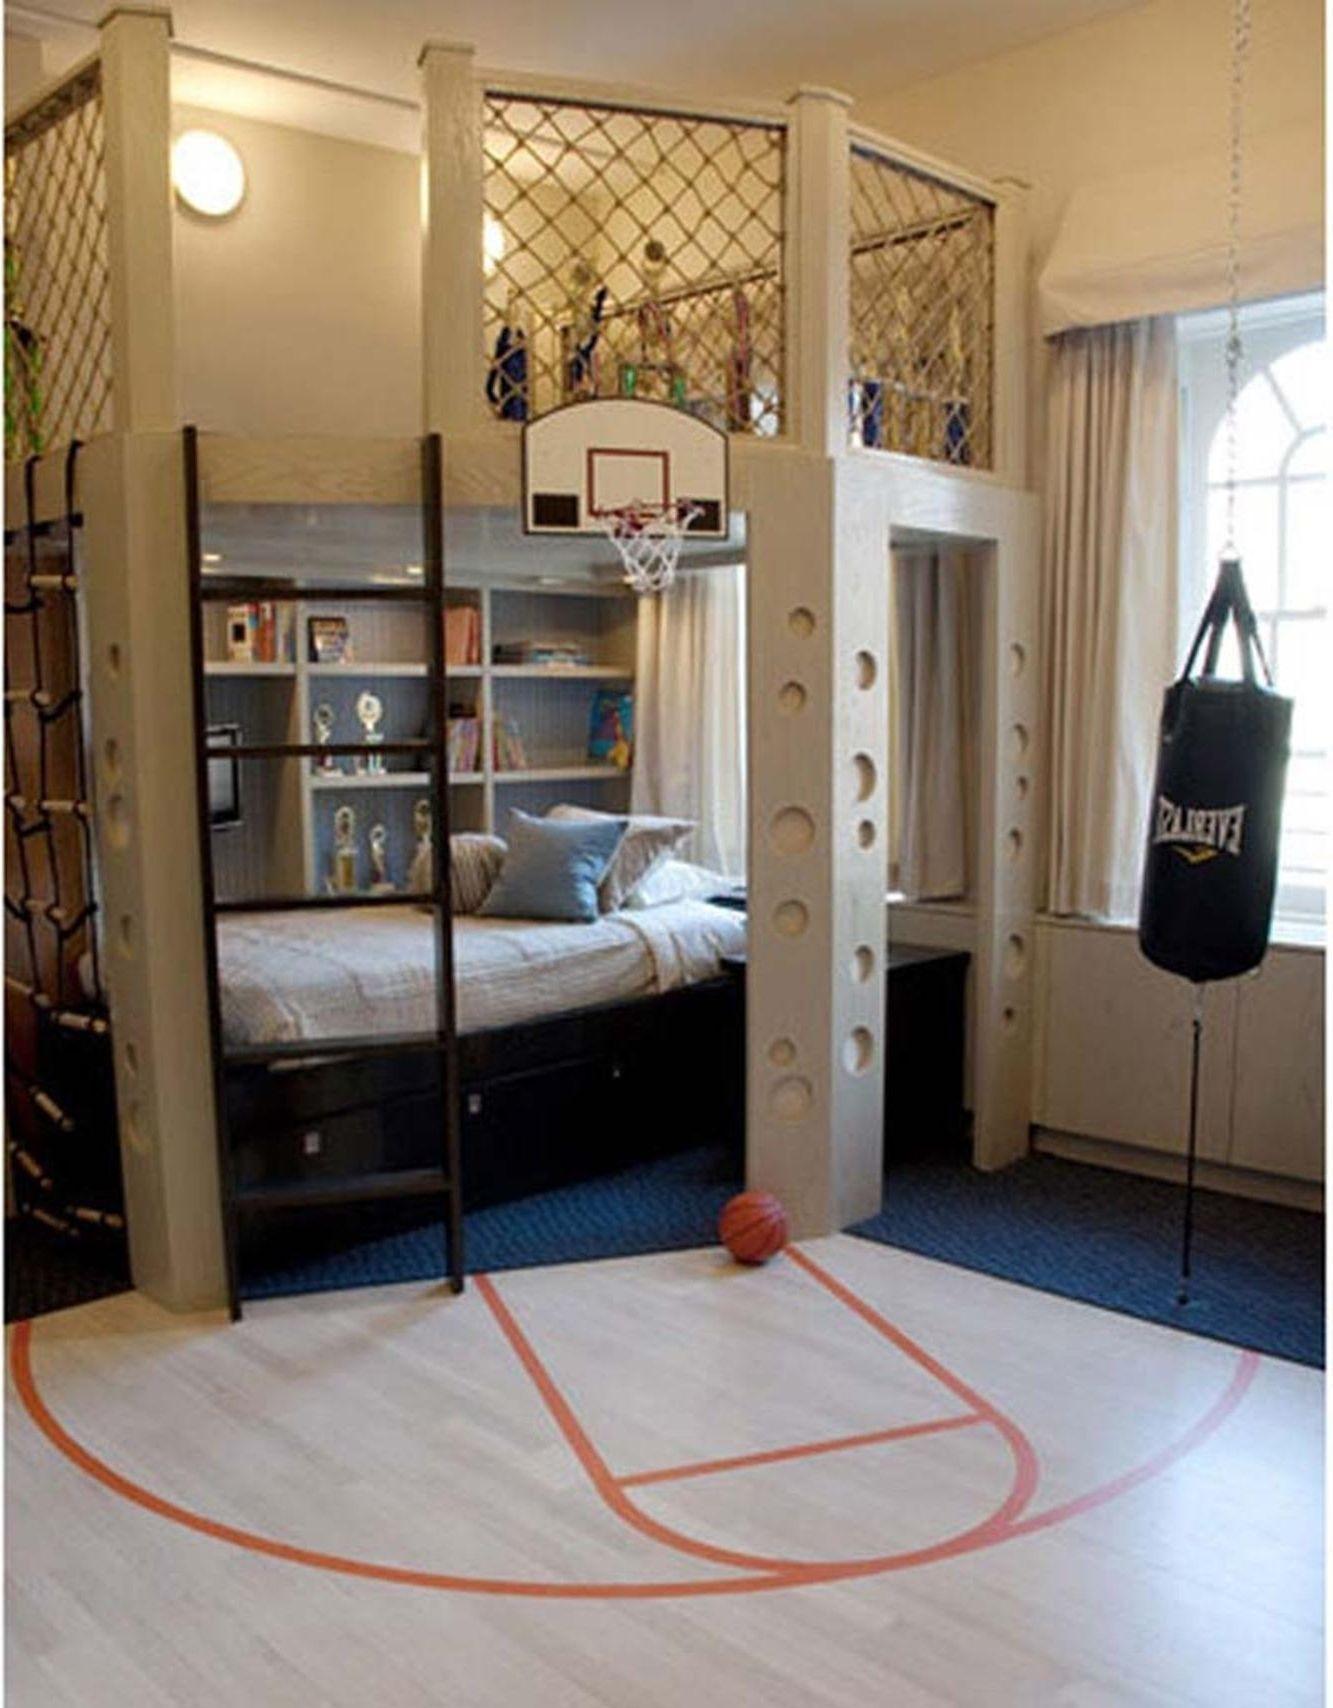 bedroom basketball boys teen boys bed teen room colorful teen inside rh pinterest com